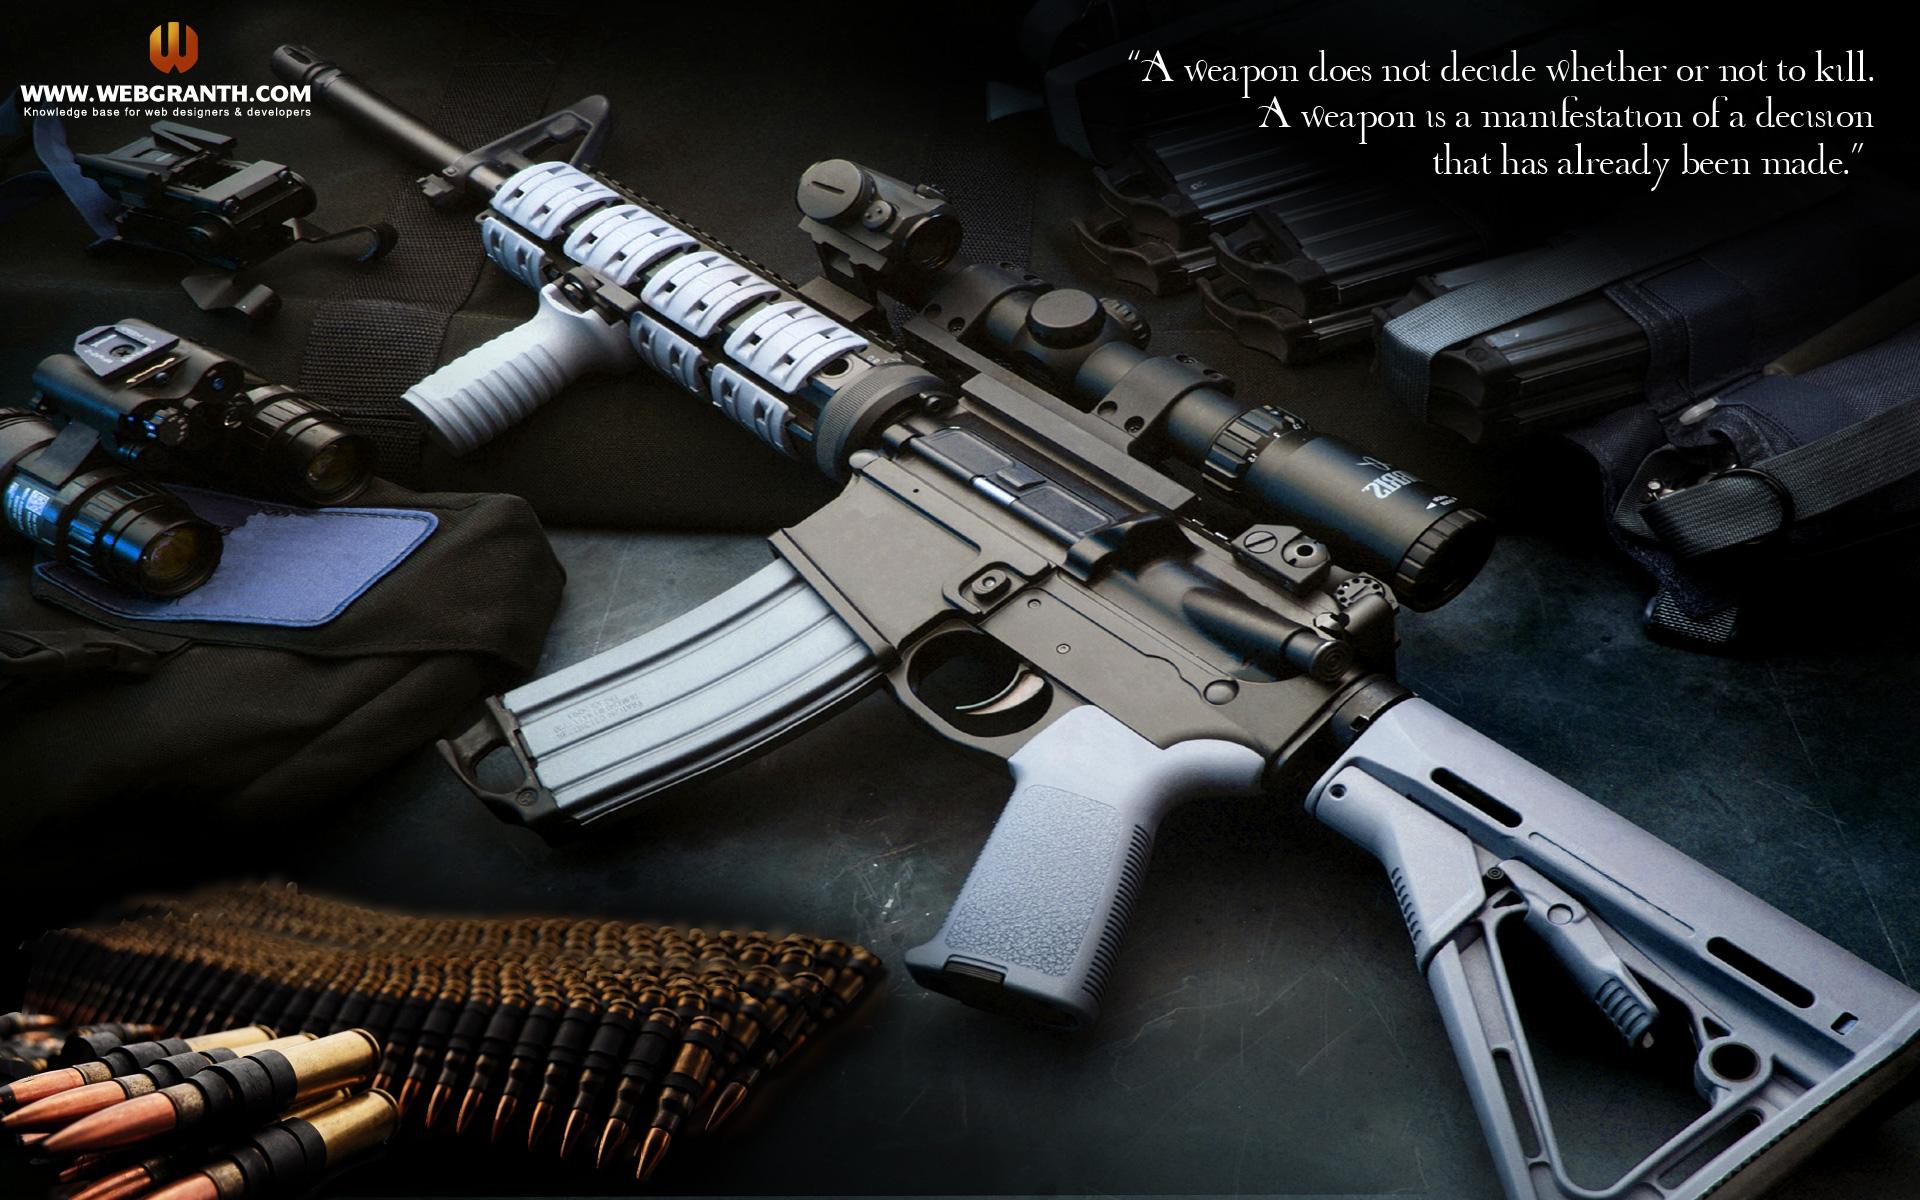 Guns Wallpaper Download HD Guns Weapons Wallpapers   Webgranth 2015 1920x1200